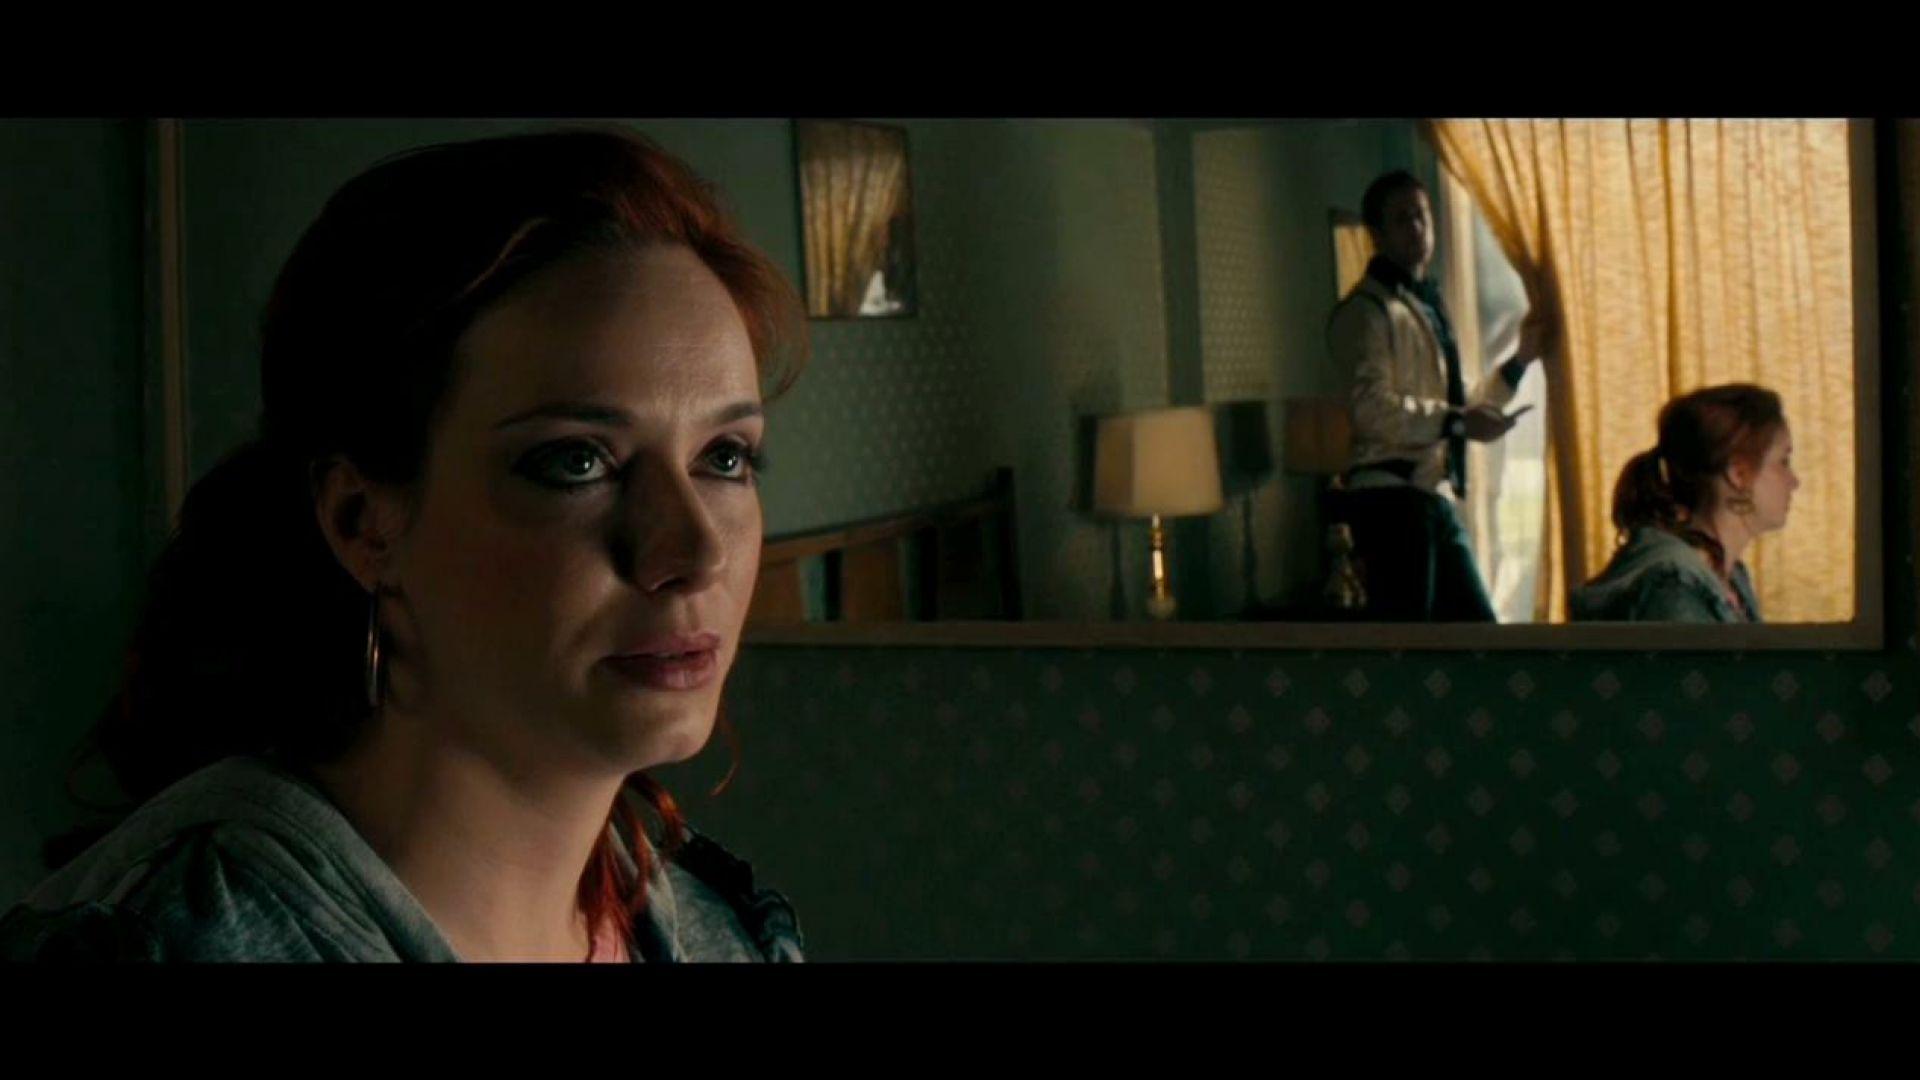 Christina Hendricks as Blanche in Drive